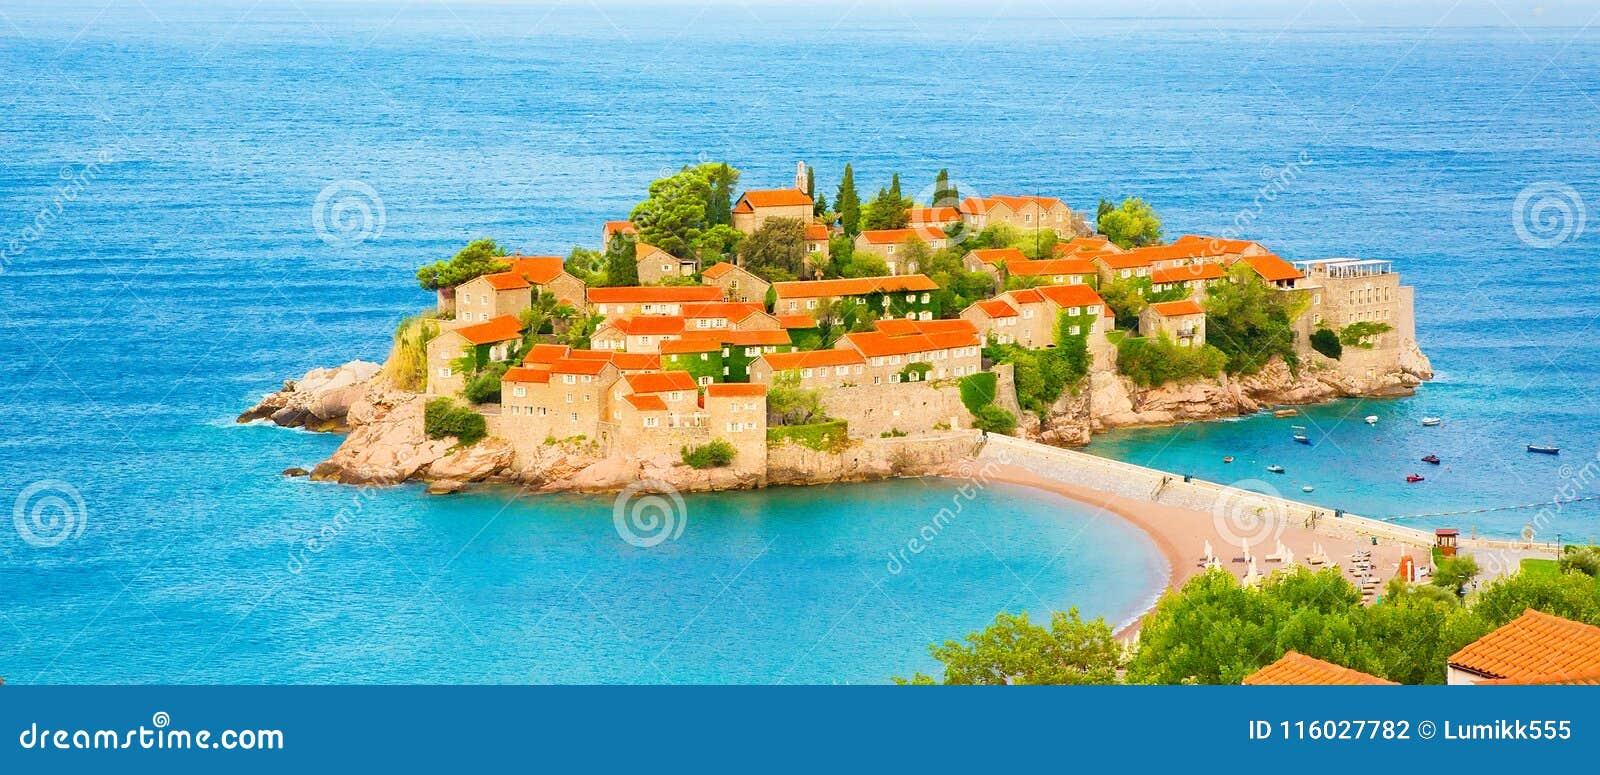 Insel Sveti Stefan auf Budva Riviera, Montenegro